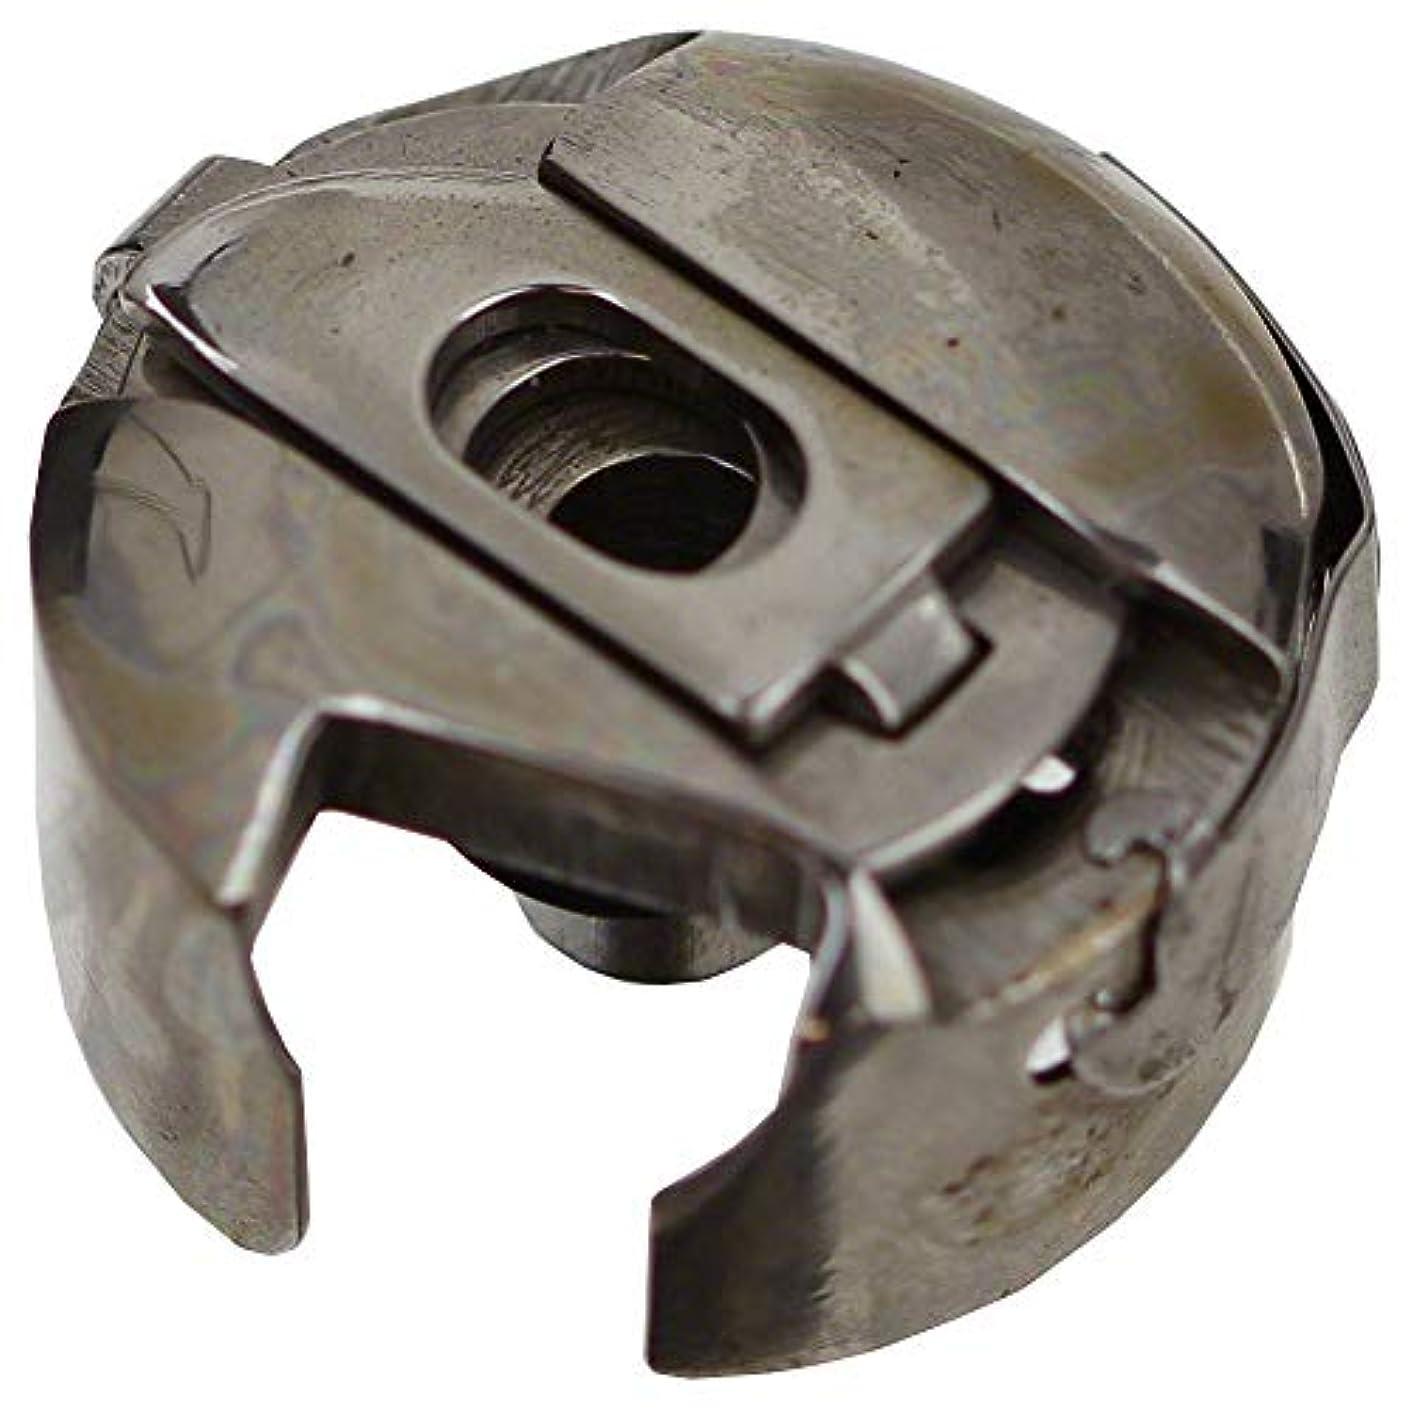 HONEYSEW Bobbin Case # 106029 for Pfaff 130, 134, 138, 230, 234. 238, 463 563Sewing Machines